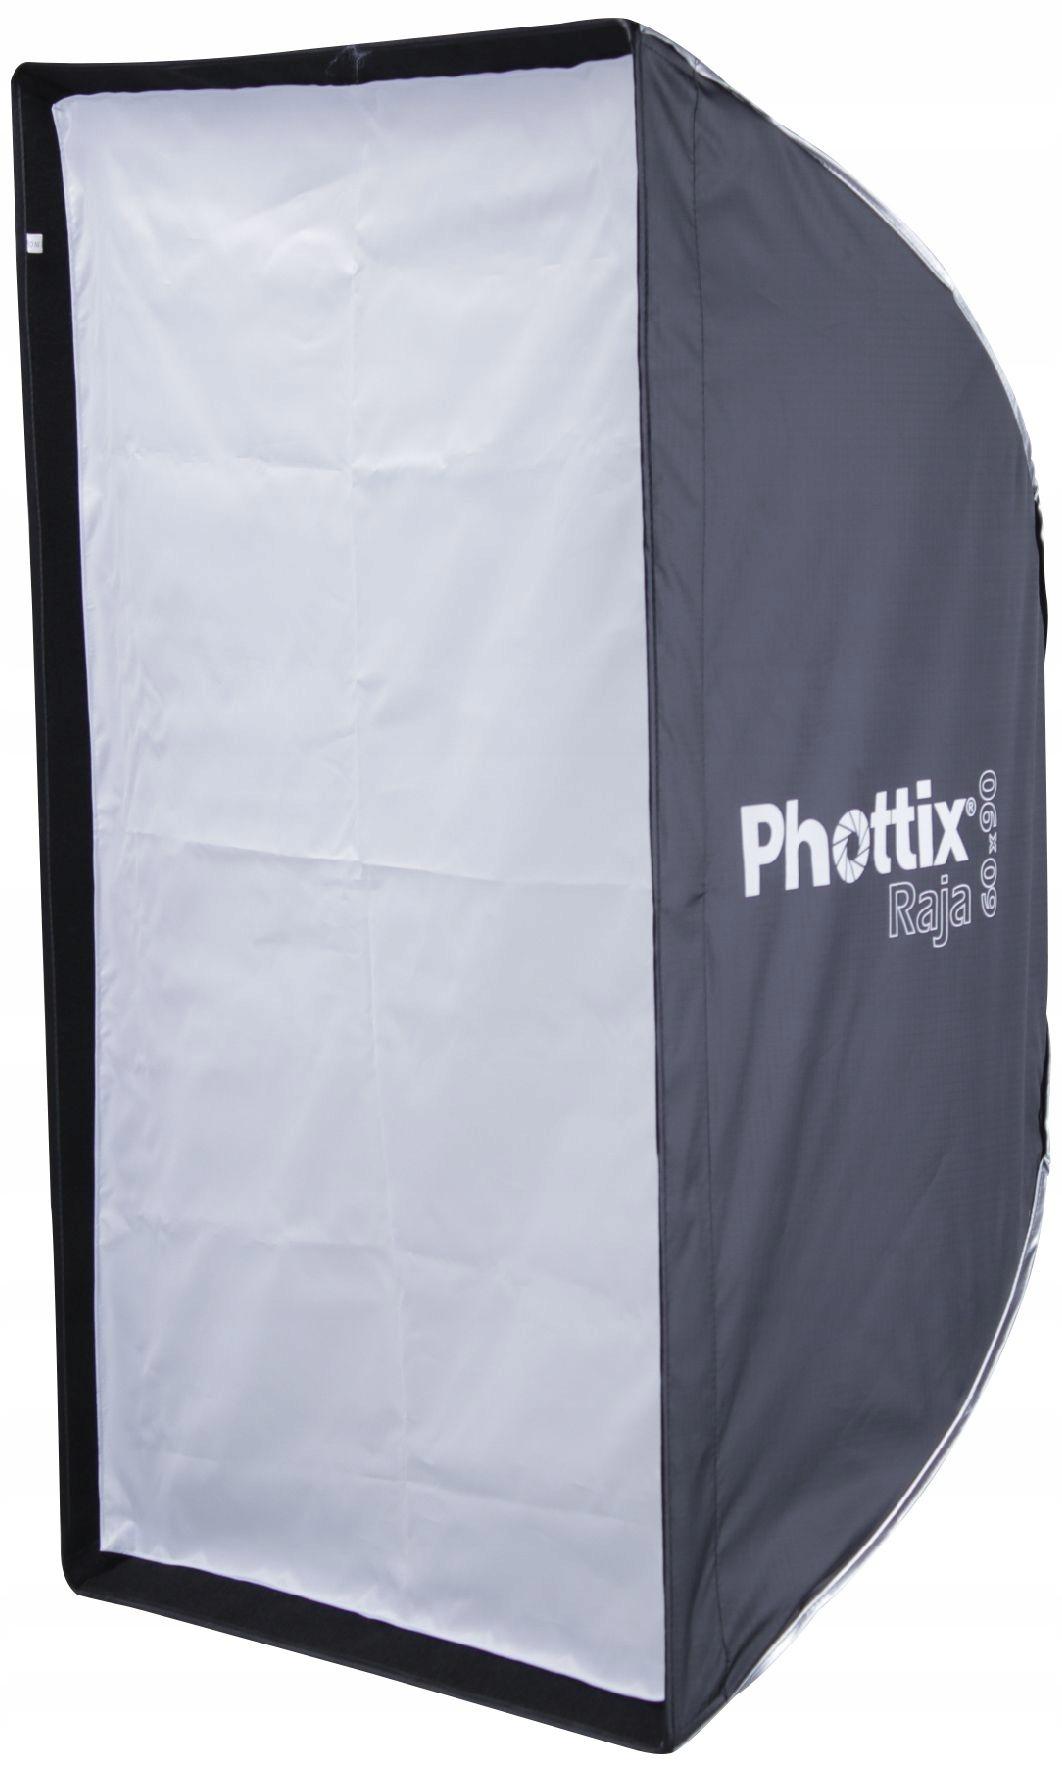 Softbox Phottix Raja 60x90cm Bowens